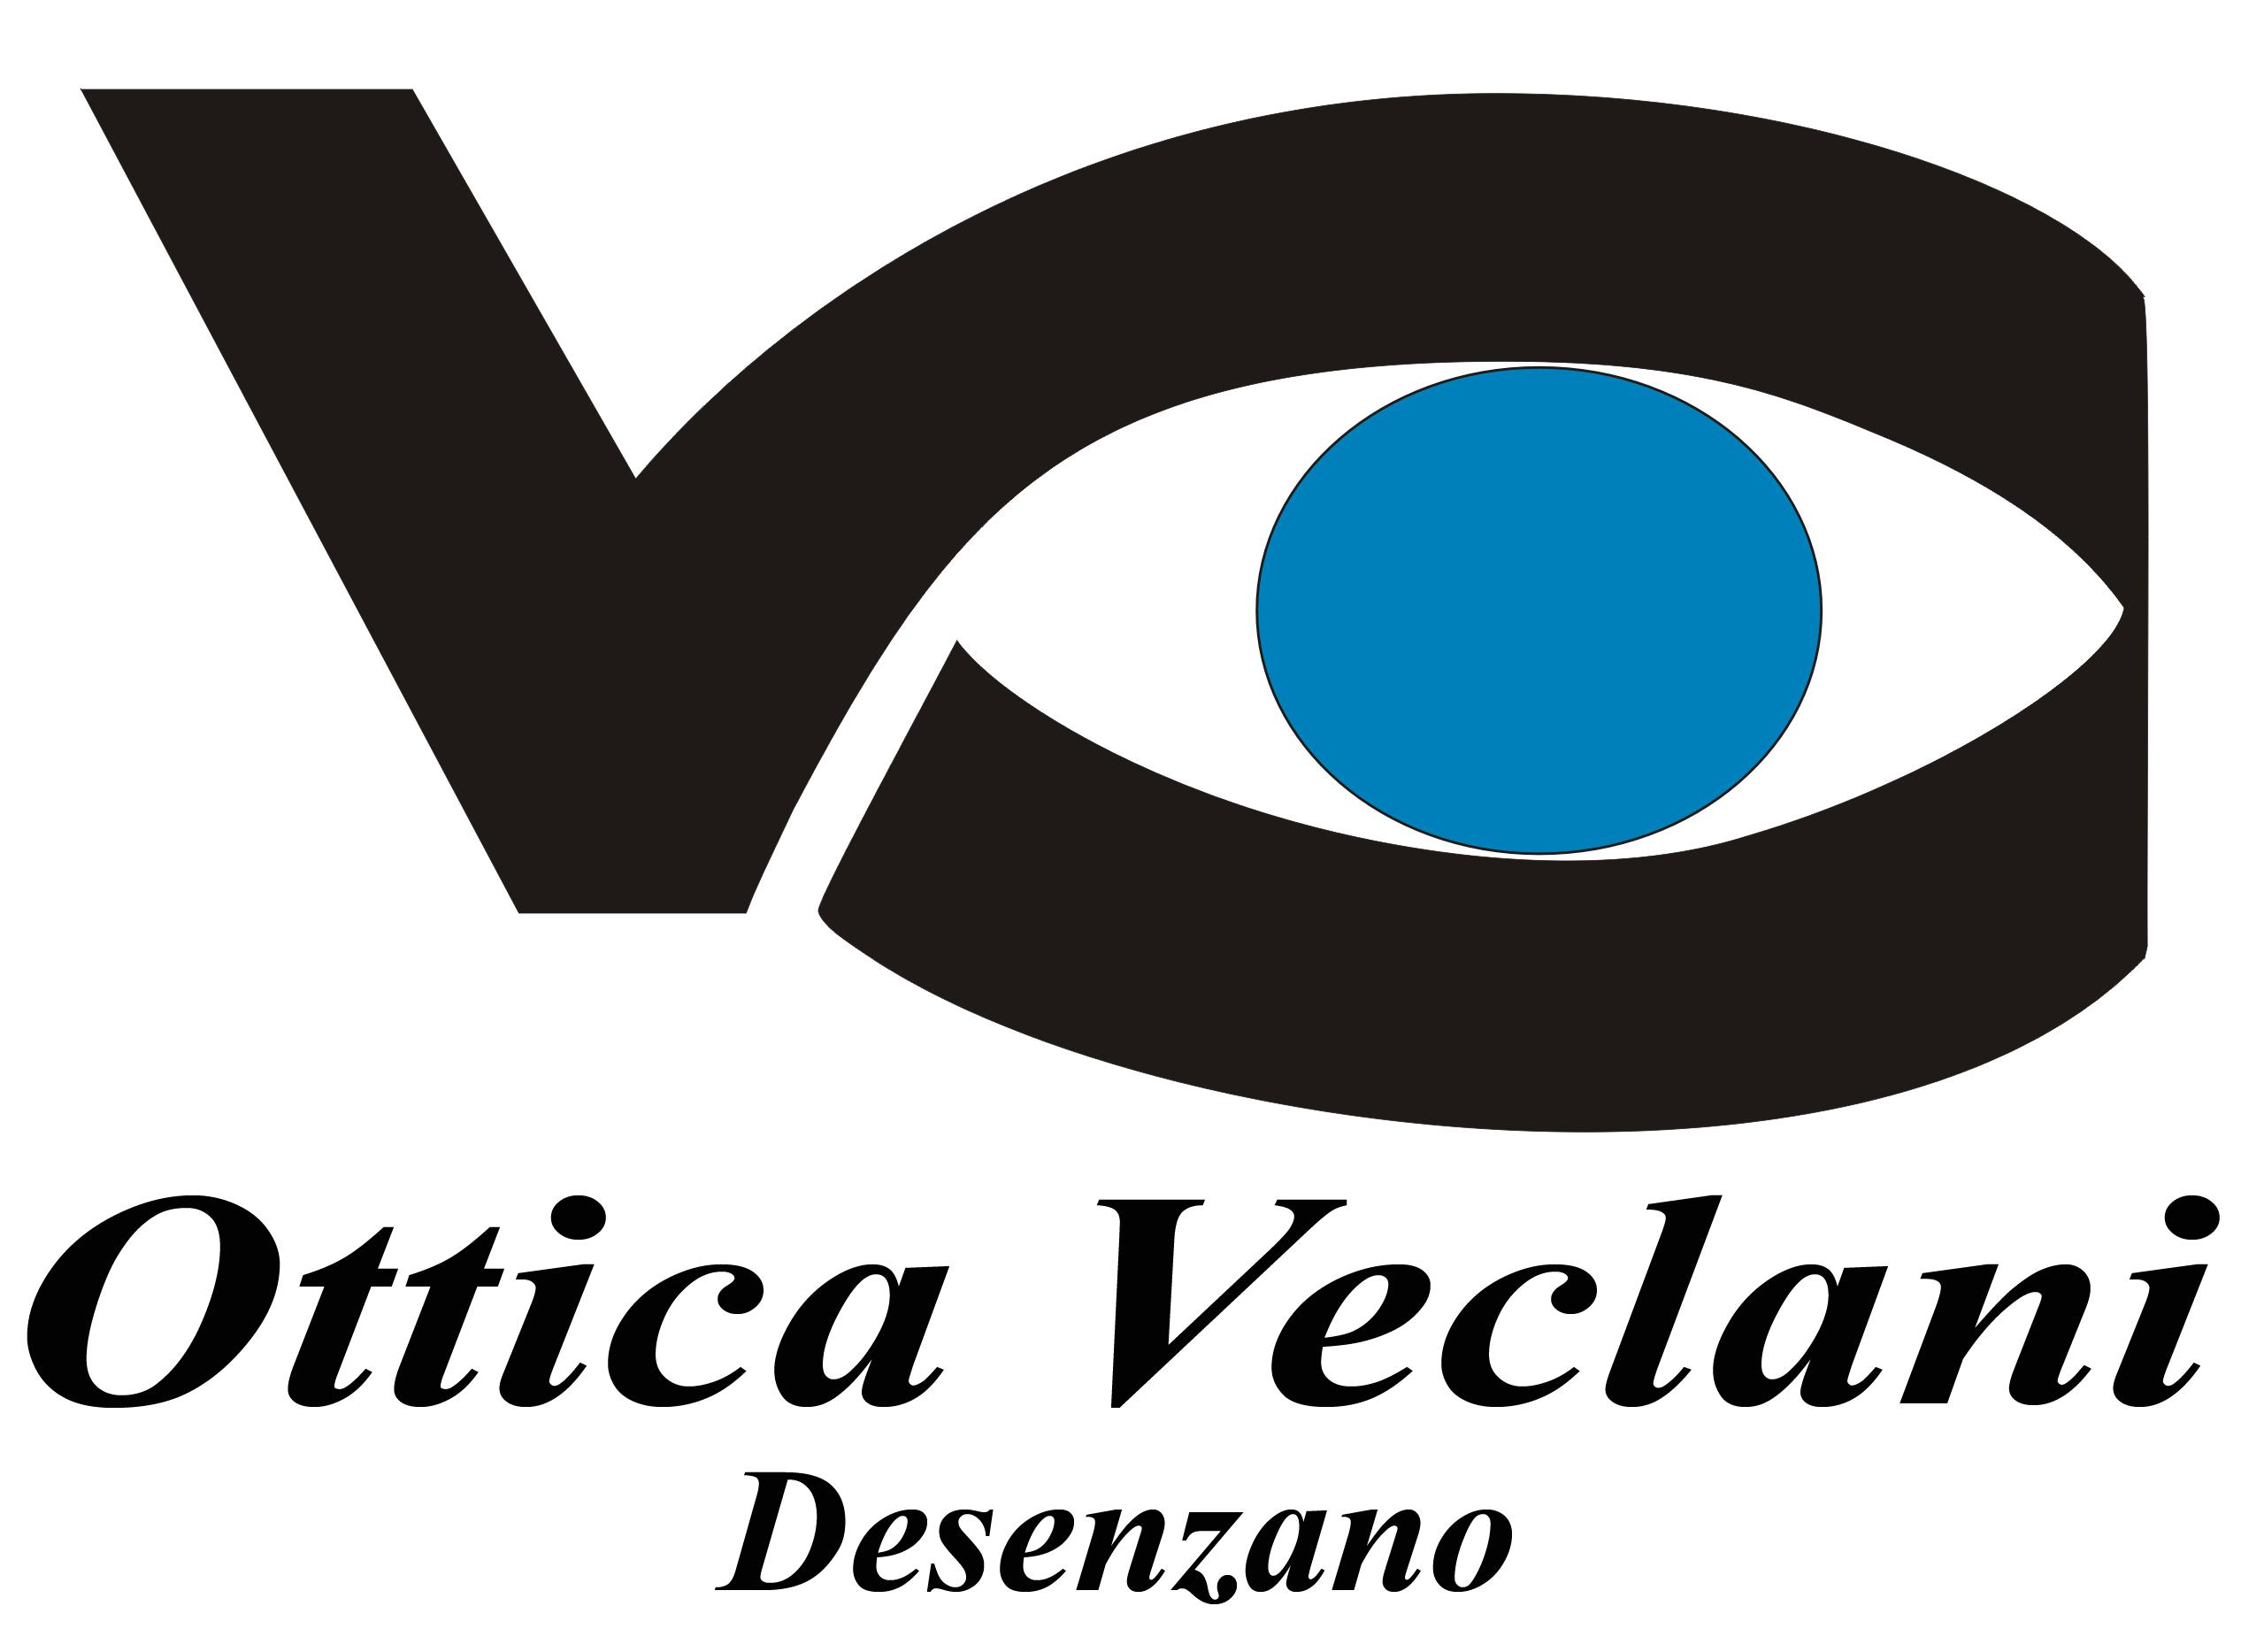 Logo-Veclani-Desenzano-1